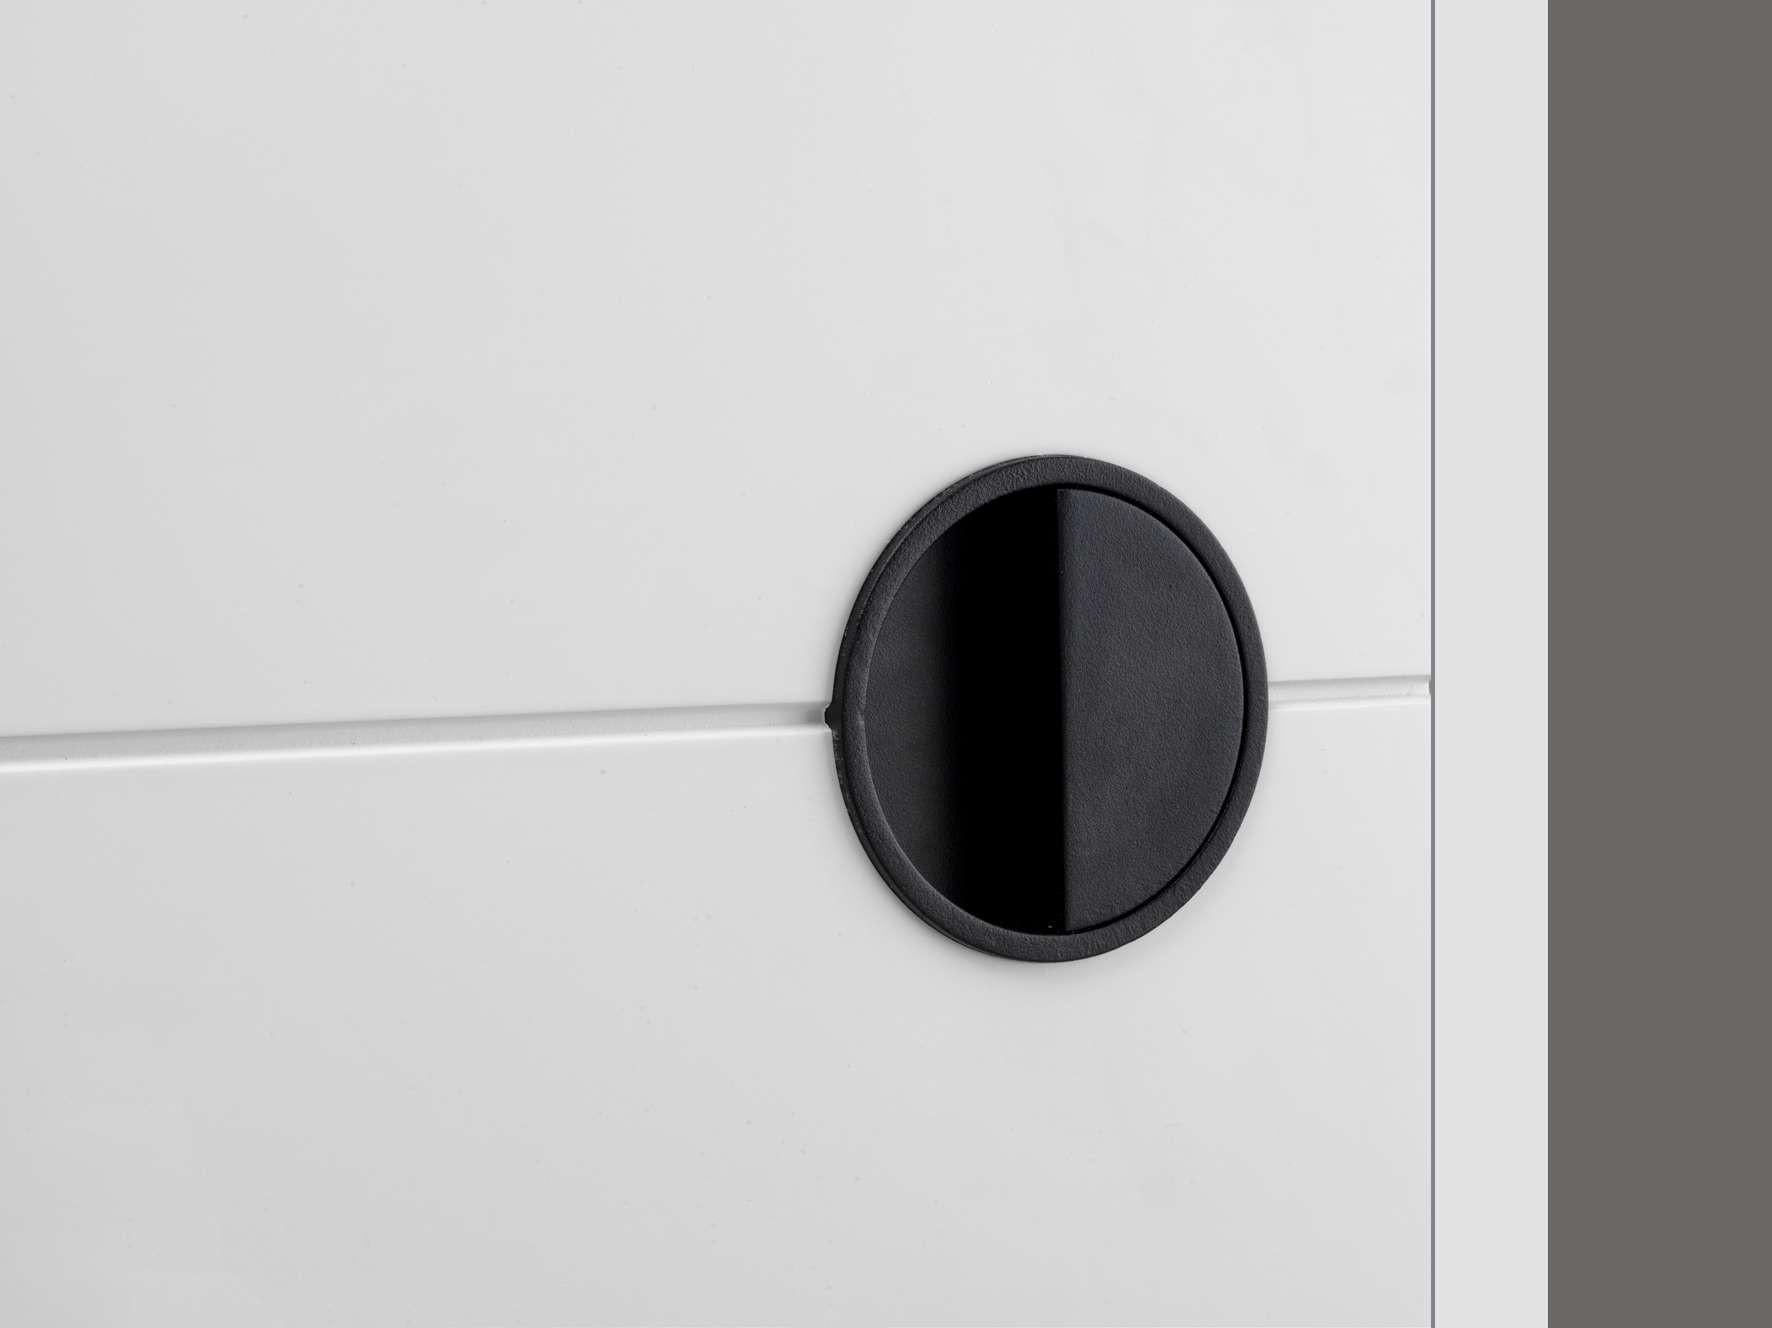 ingebouwde-deurkruk-modern